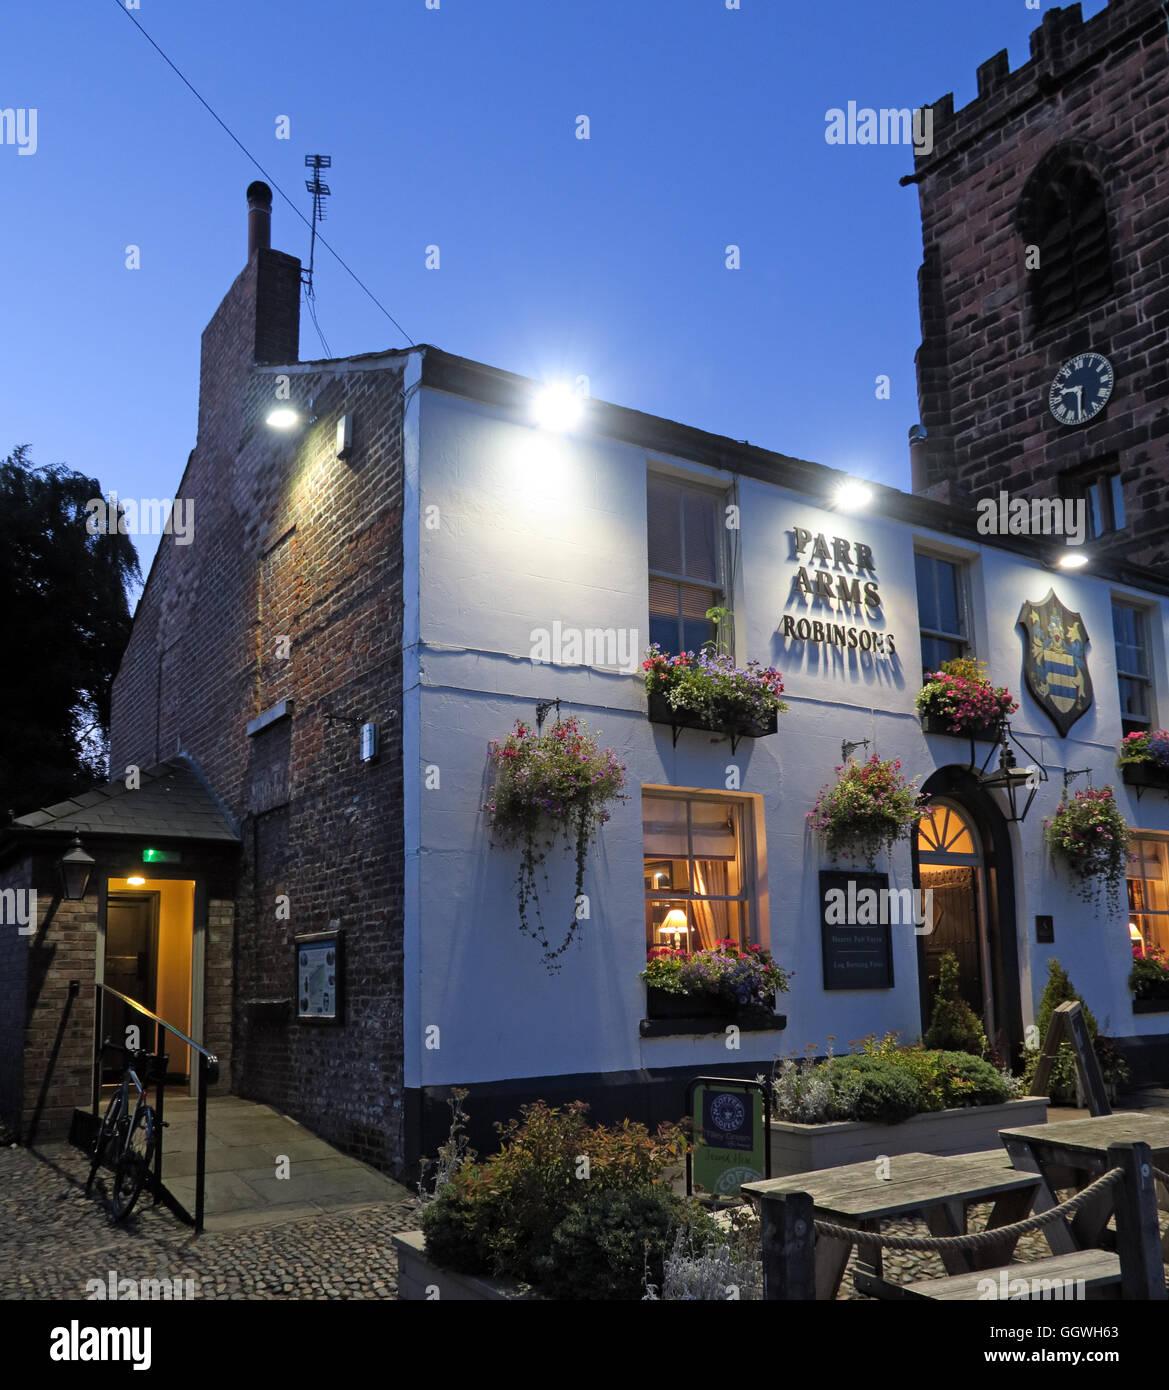 Parr Arms Pub,Grappenhall Village,Warrington,Cheshire,England, UK at night Stock Photo